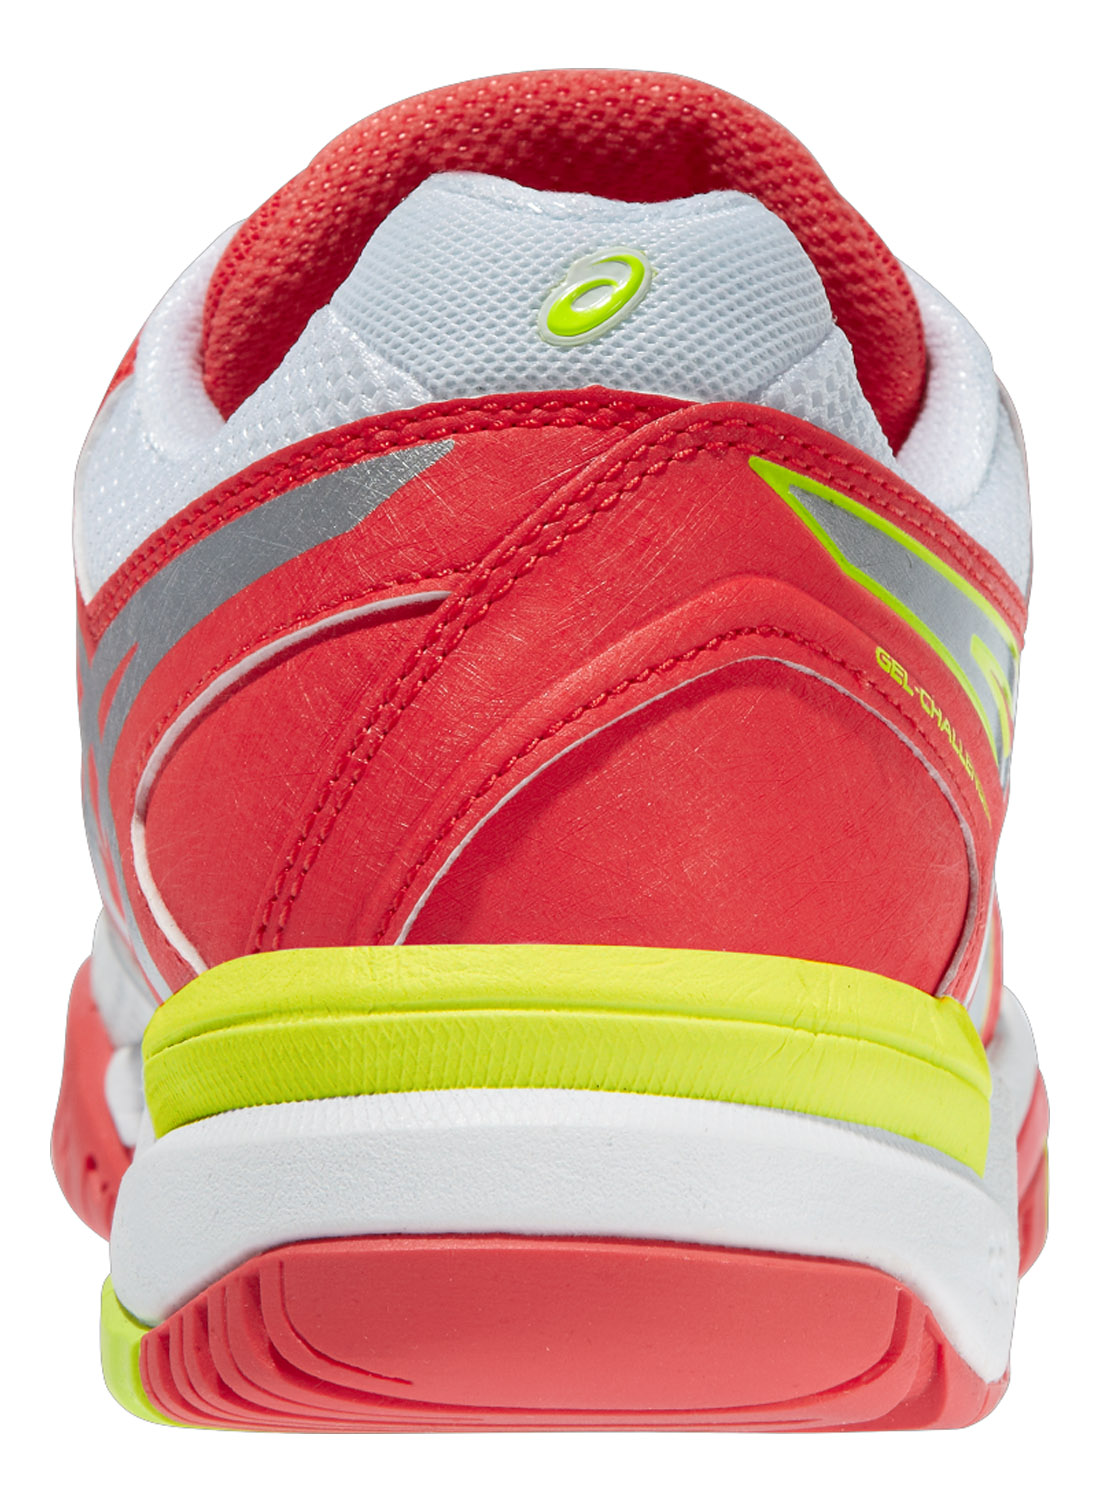 10 2015 Destockage Gel De Tennis Asics Chaussures Challenger Operation Femme wT0YO1q